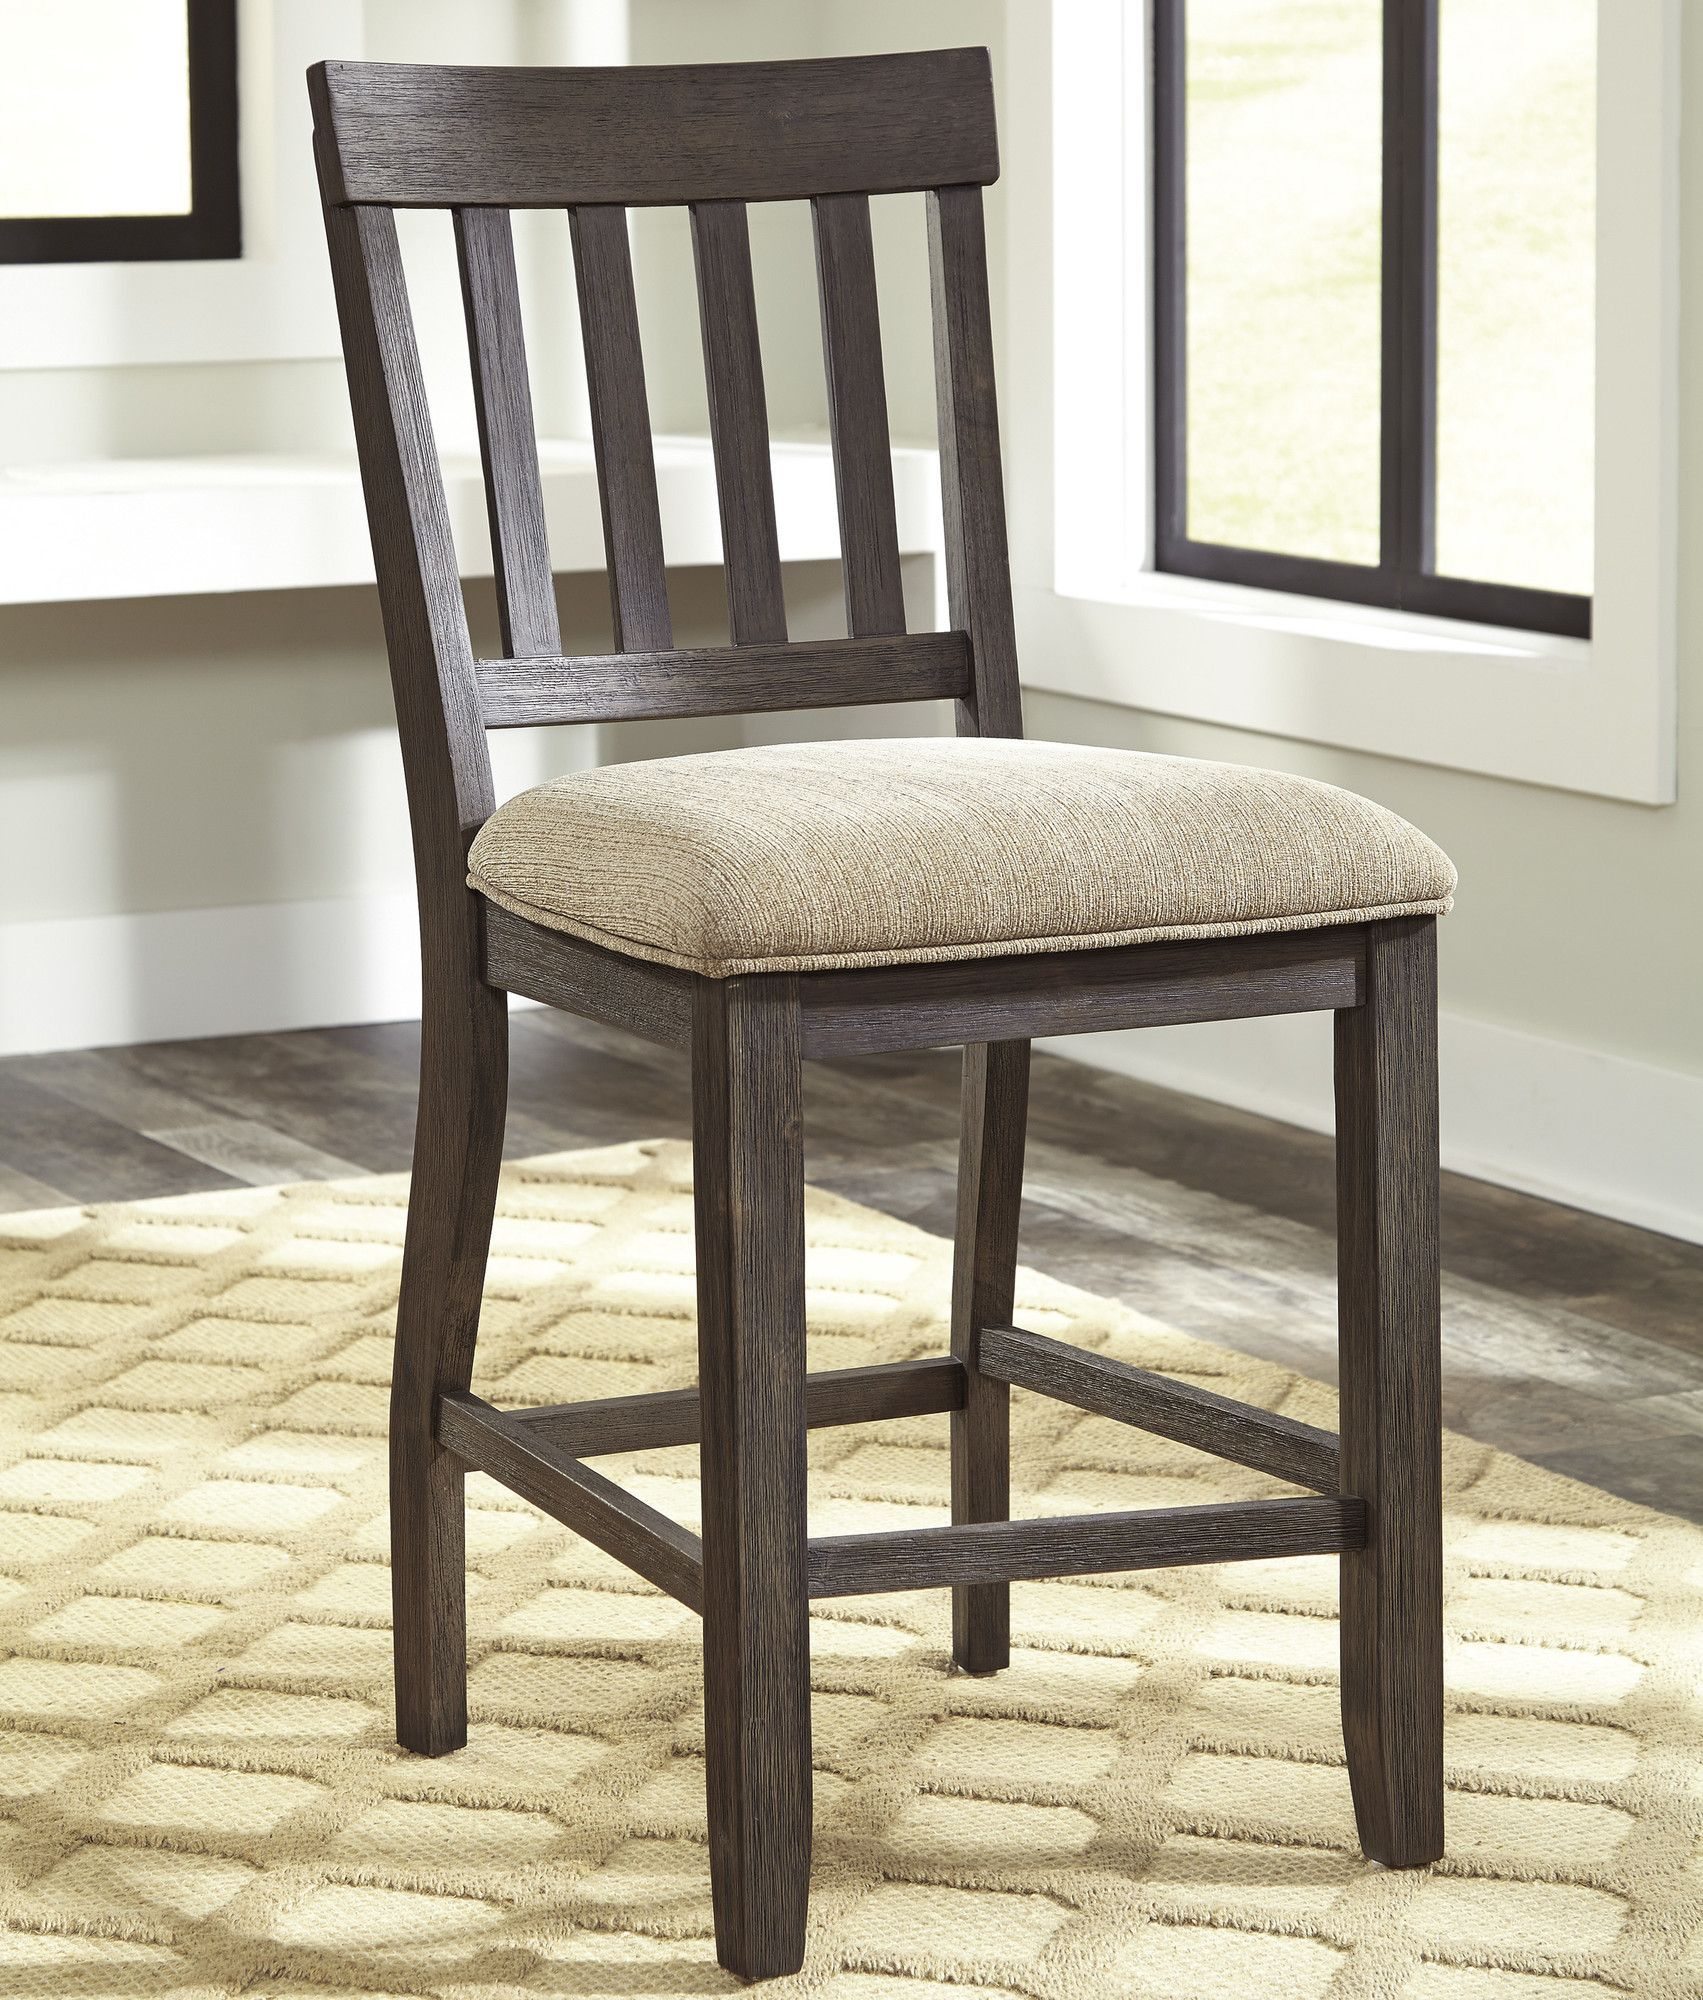 Dresbar bar stool with cushion